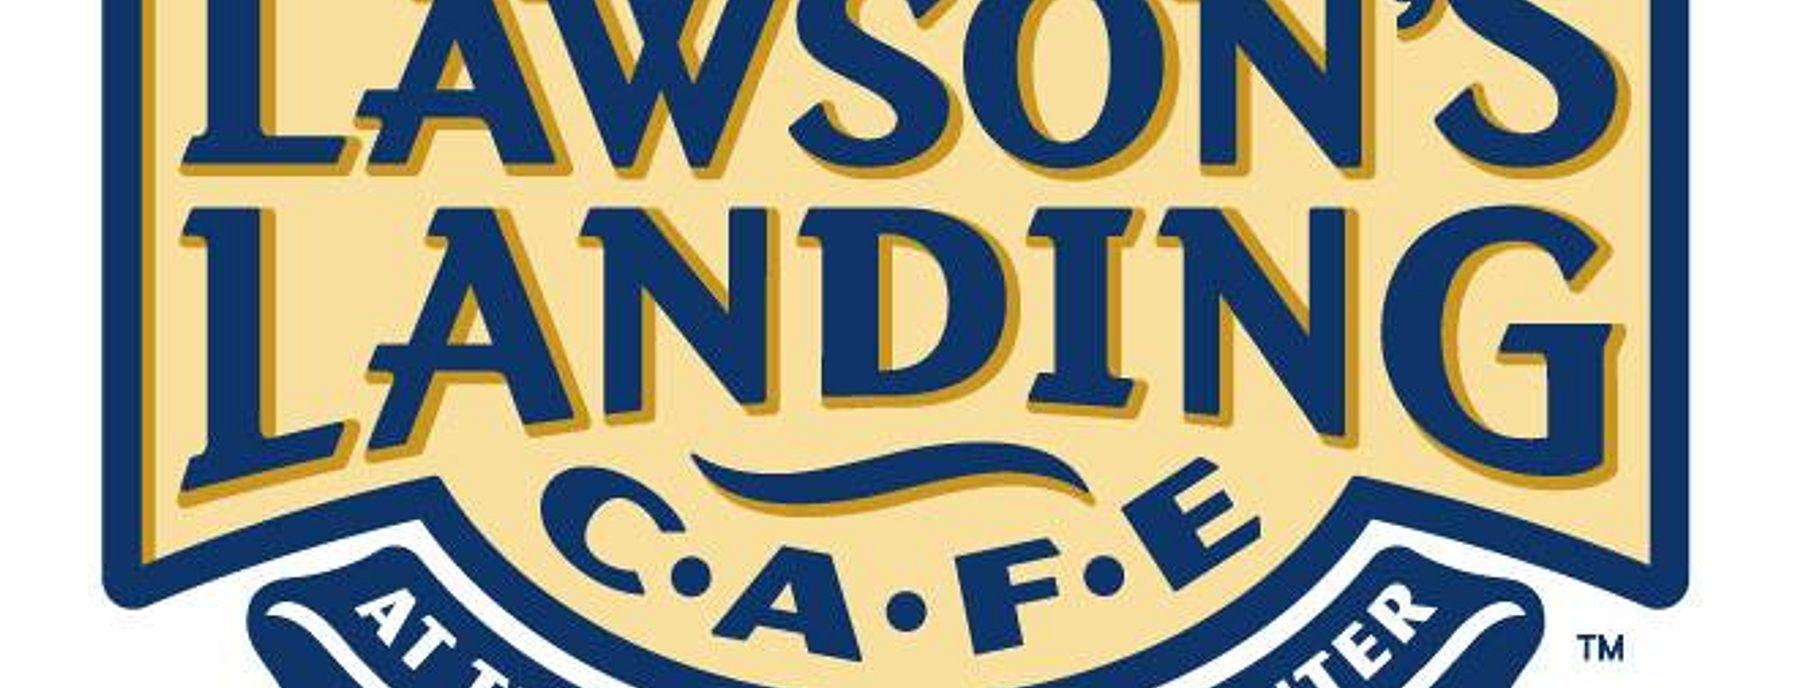 Lawson's Landing Cafe